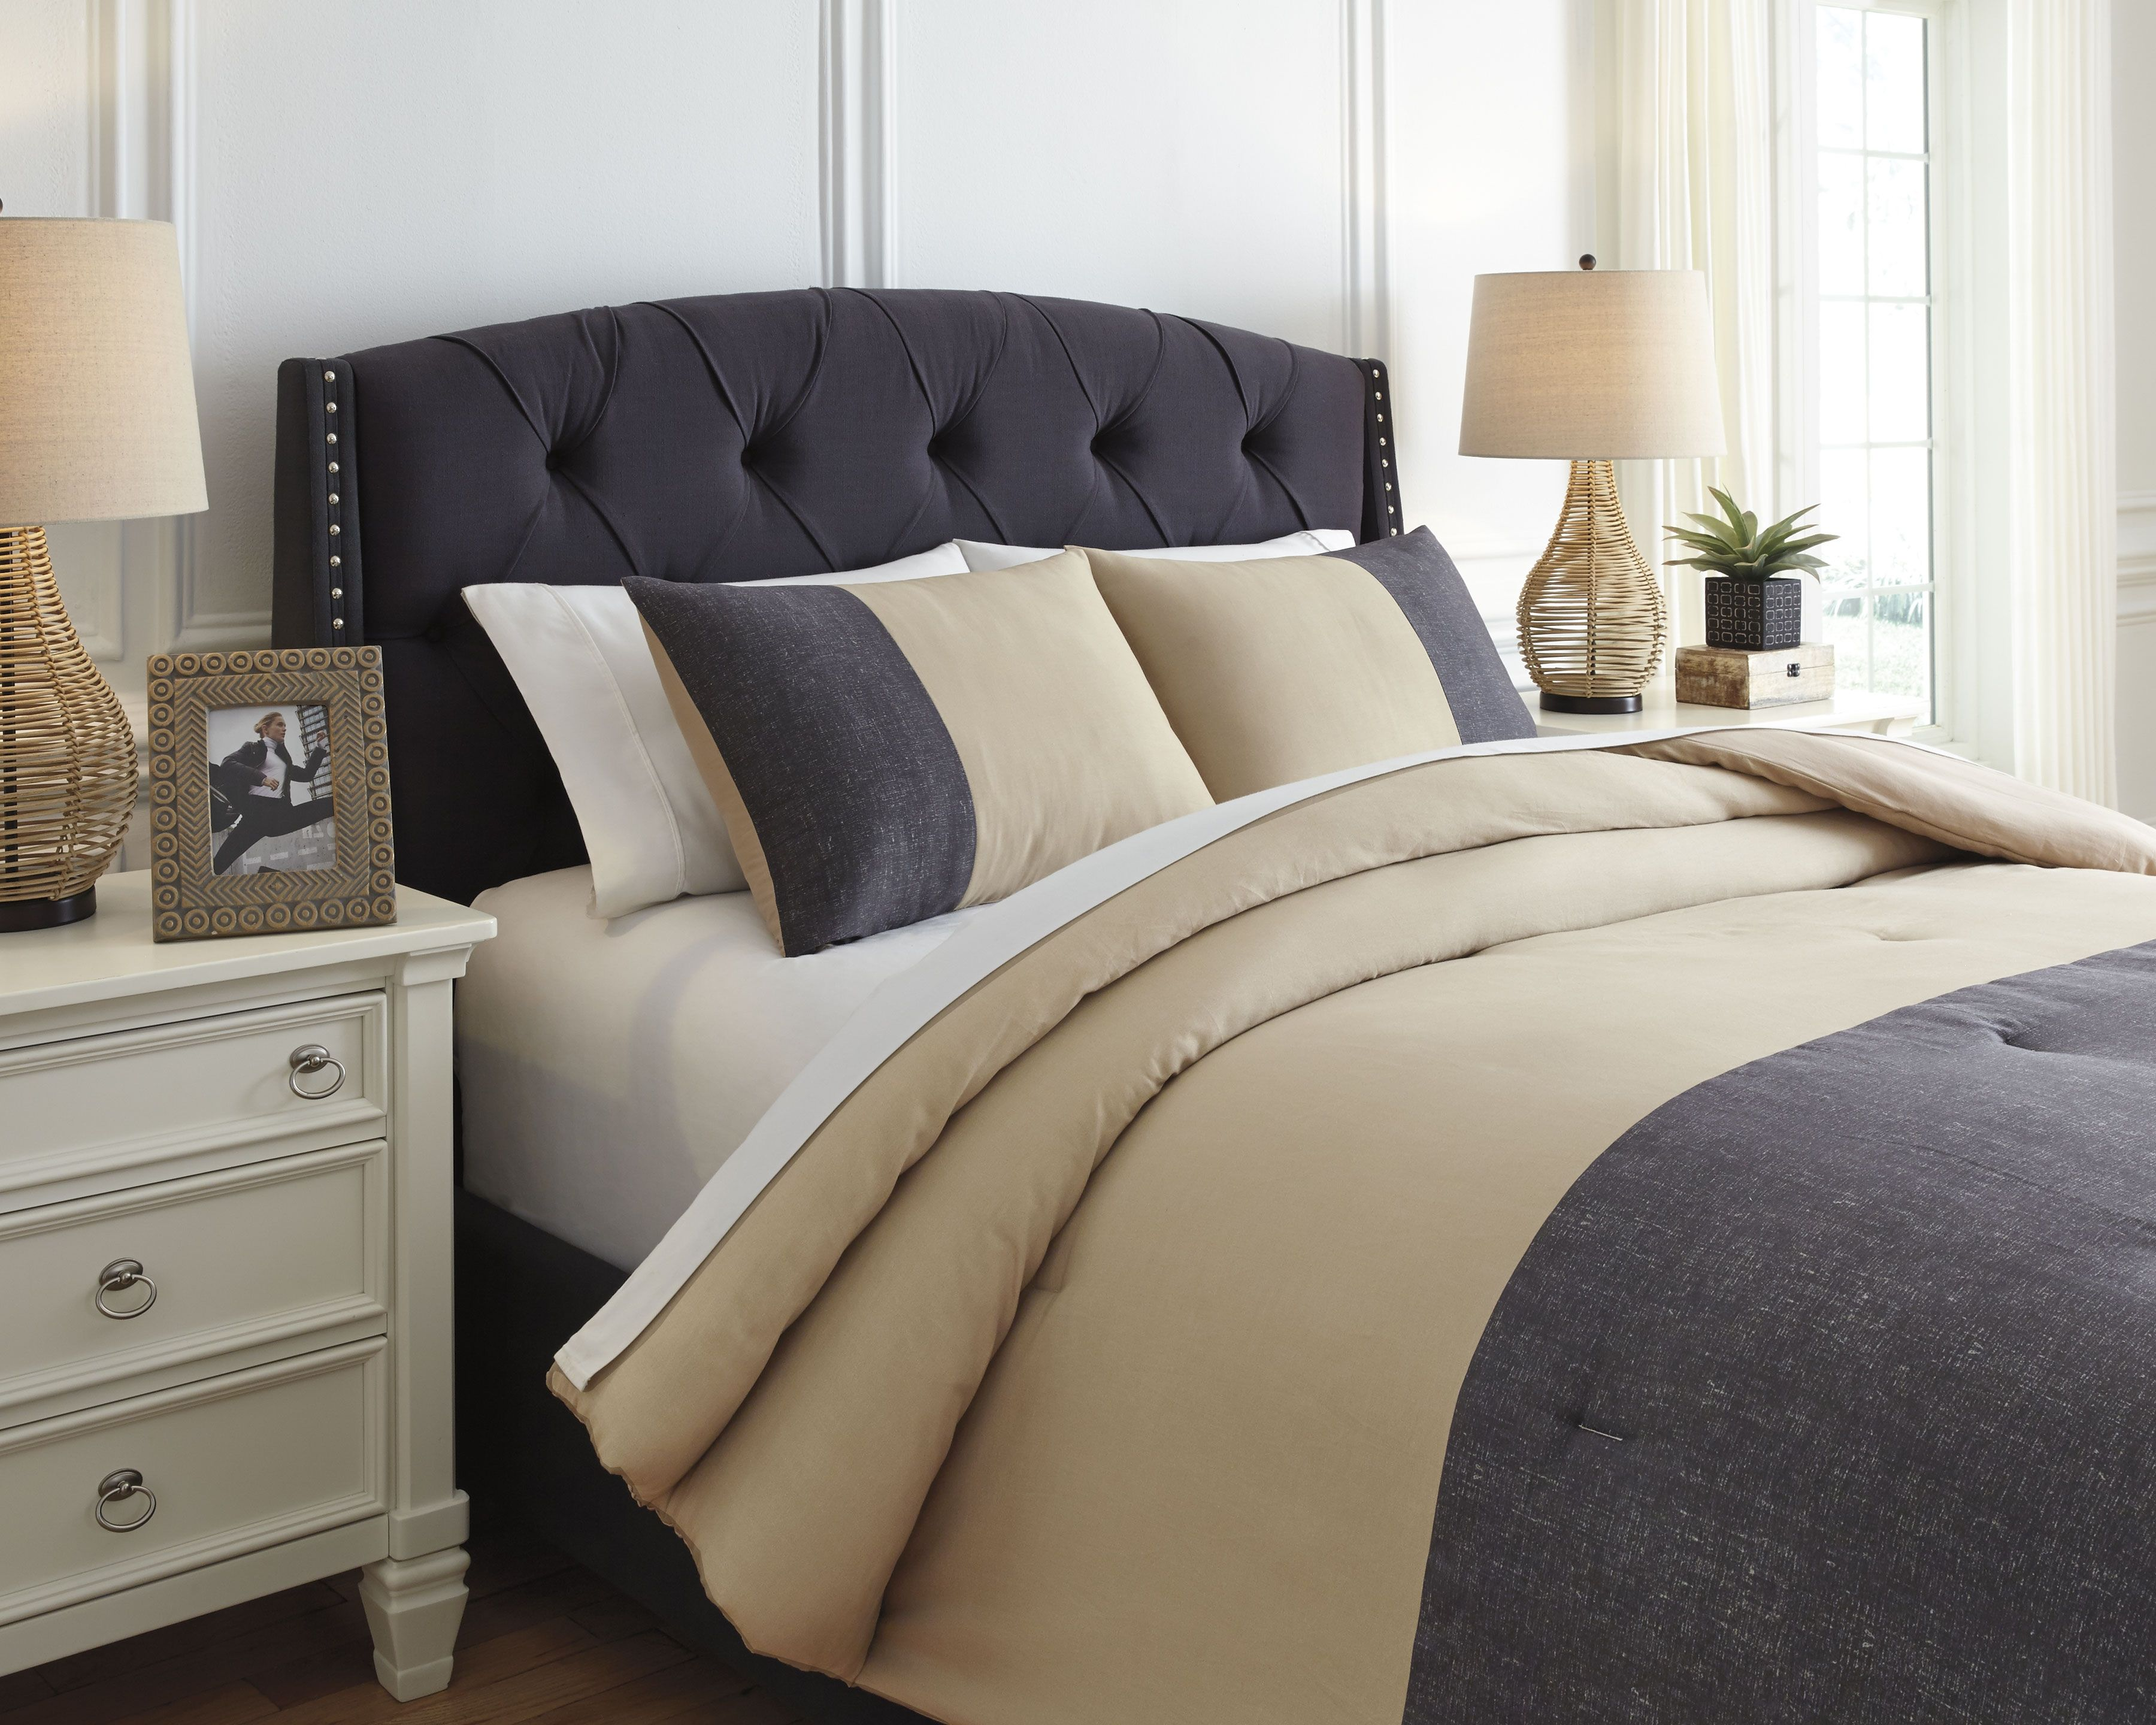 Medi 3 Piece Queen Comforter Set Charcoal Sand Comforter Sets King Comforter Sets Queen Comforter Sets